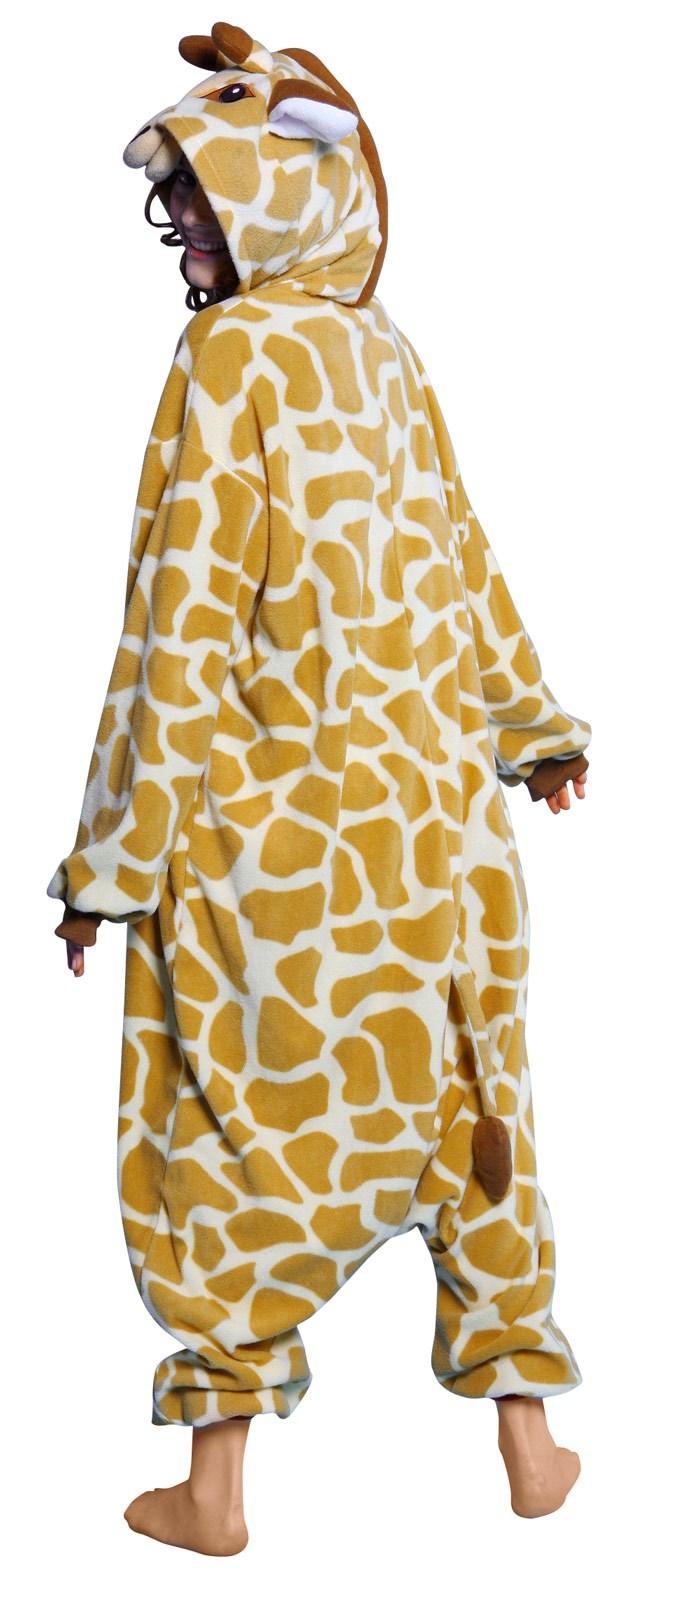 bcozy giraffe costume buycostumes com